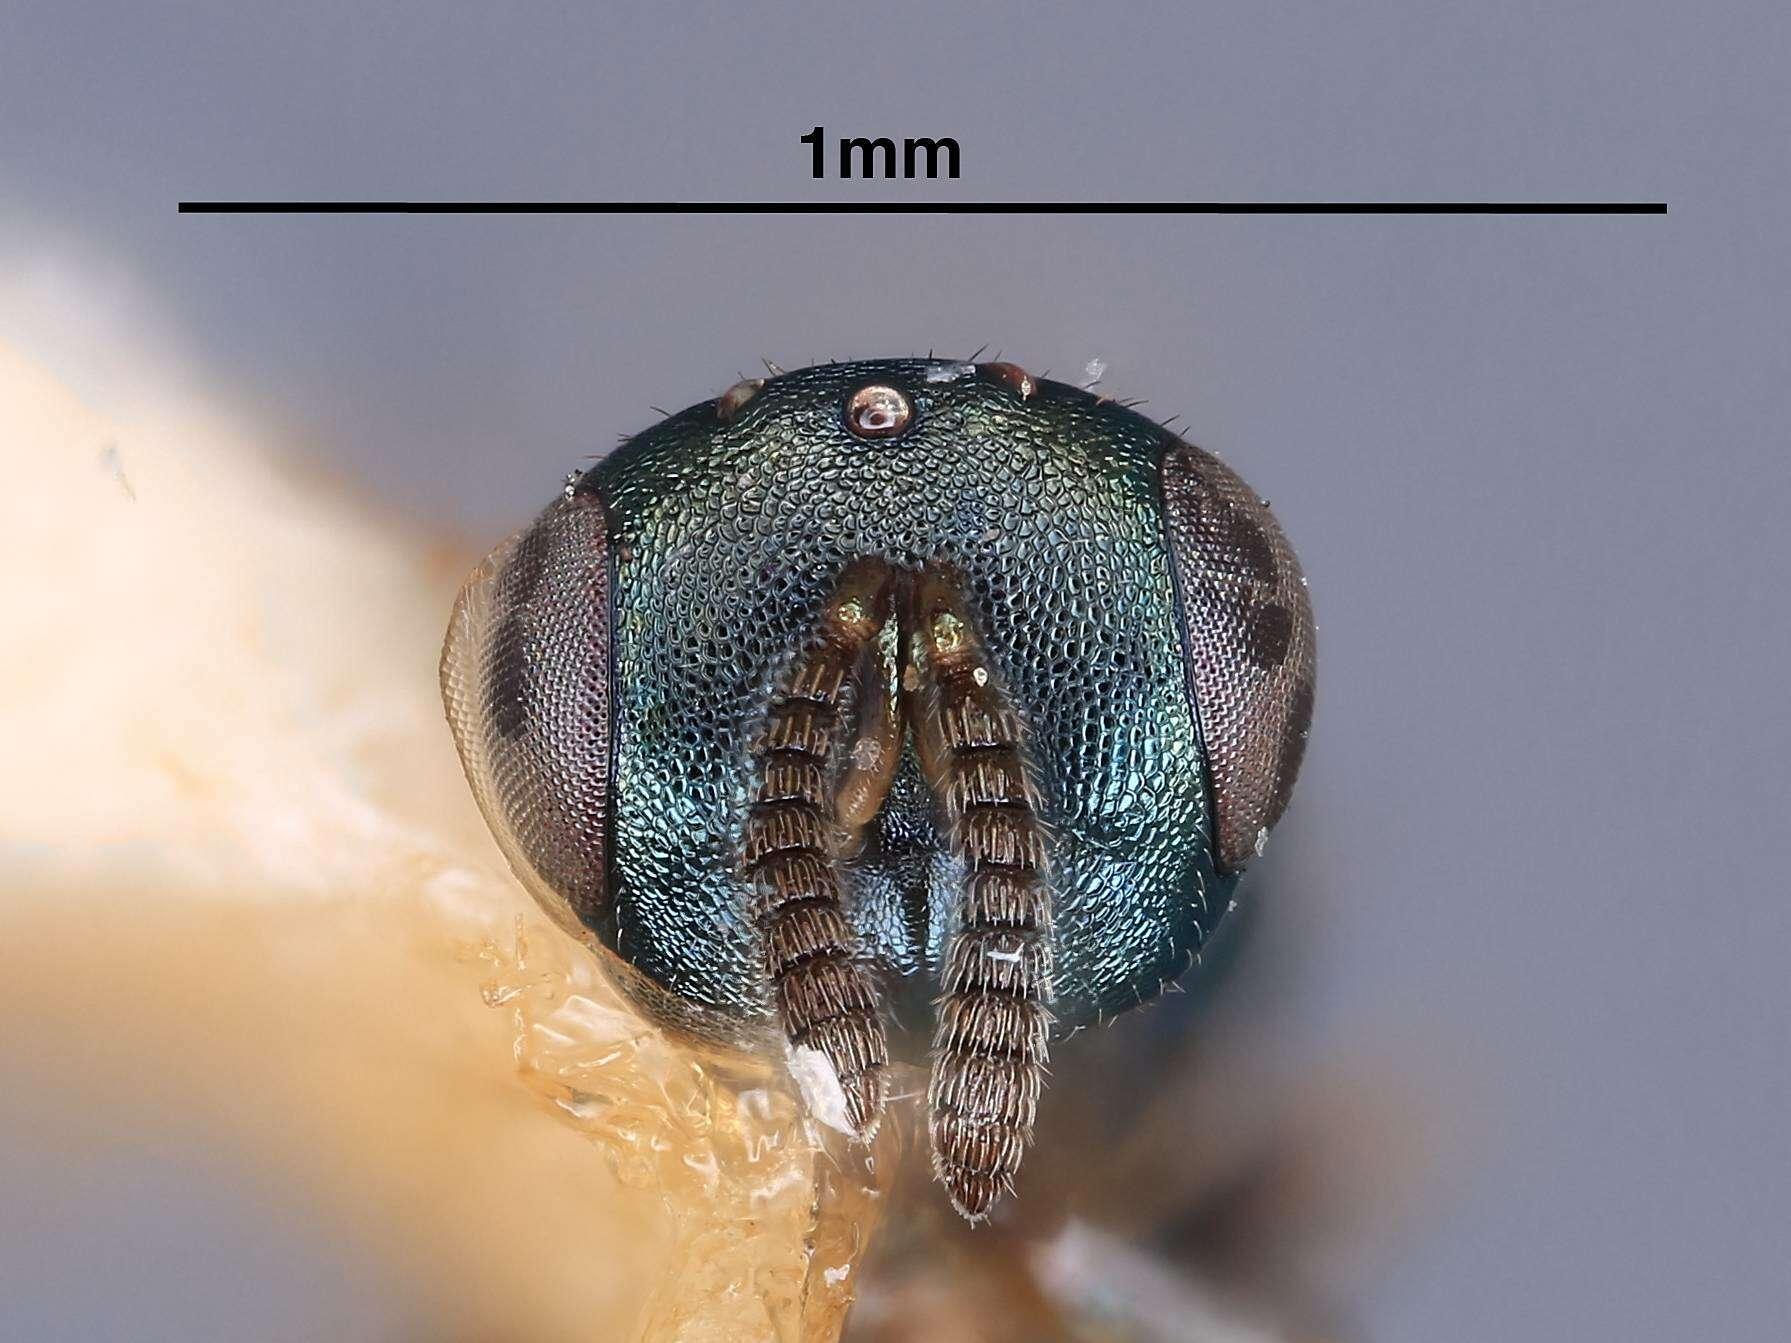 Image of pteromalids